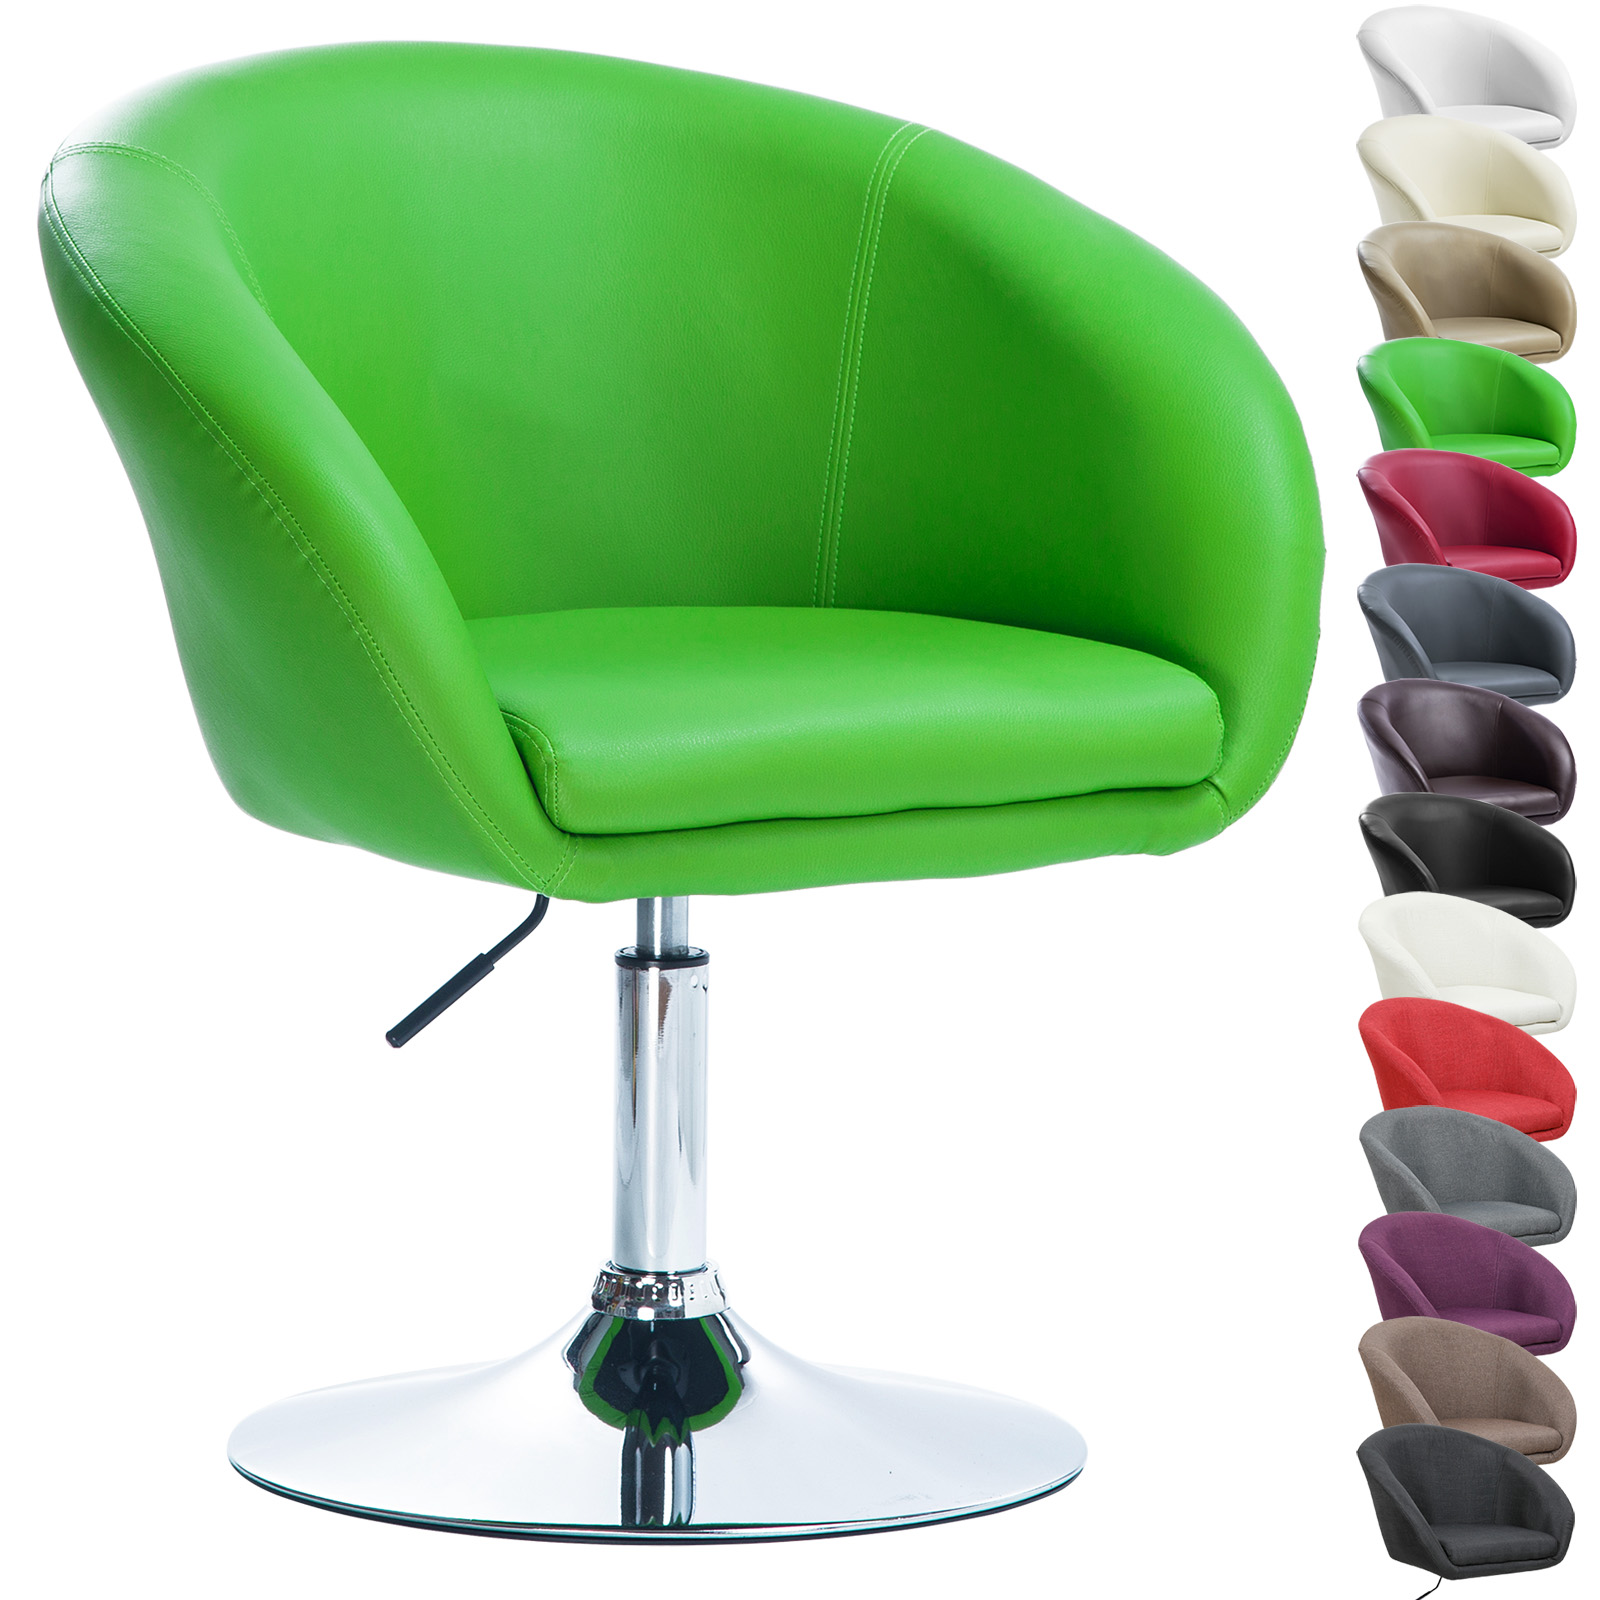 barhocker 2er bar sitz tresenhocker stuhl hocker. Black Bedroom Furniture Sets. Home Design Ideas